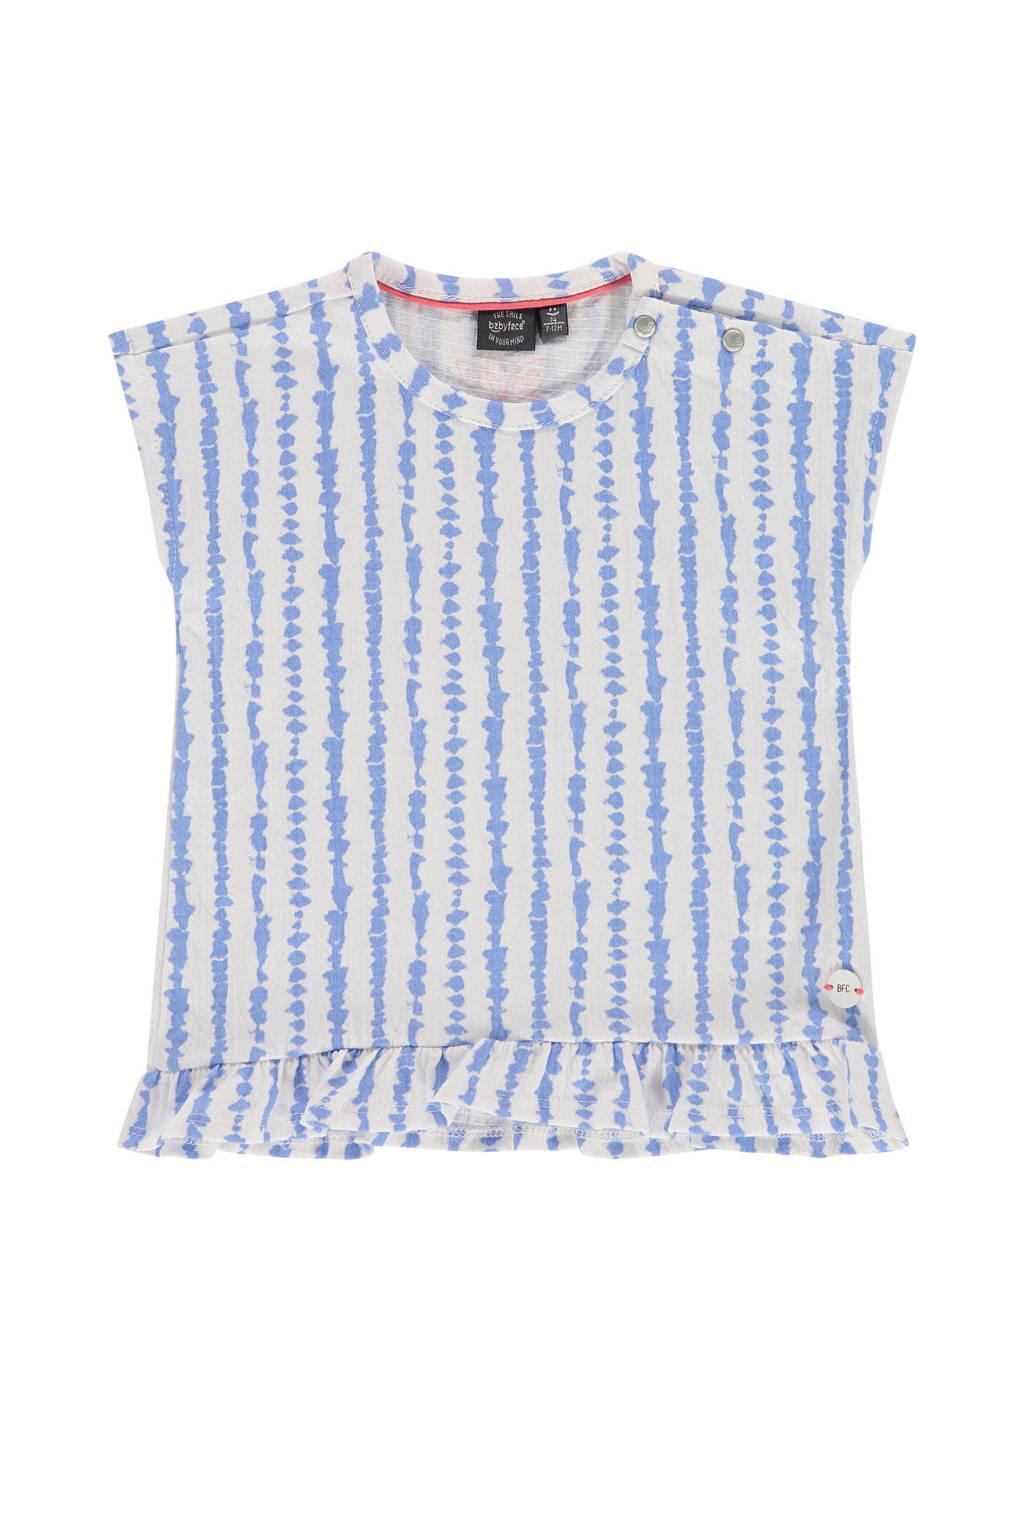 Babyface gestreept T-shirt lavendelblauw/wit, Lavendelblauw/wit